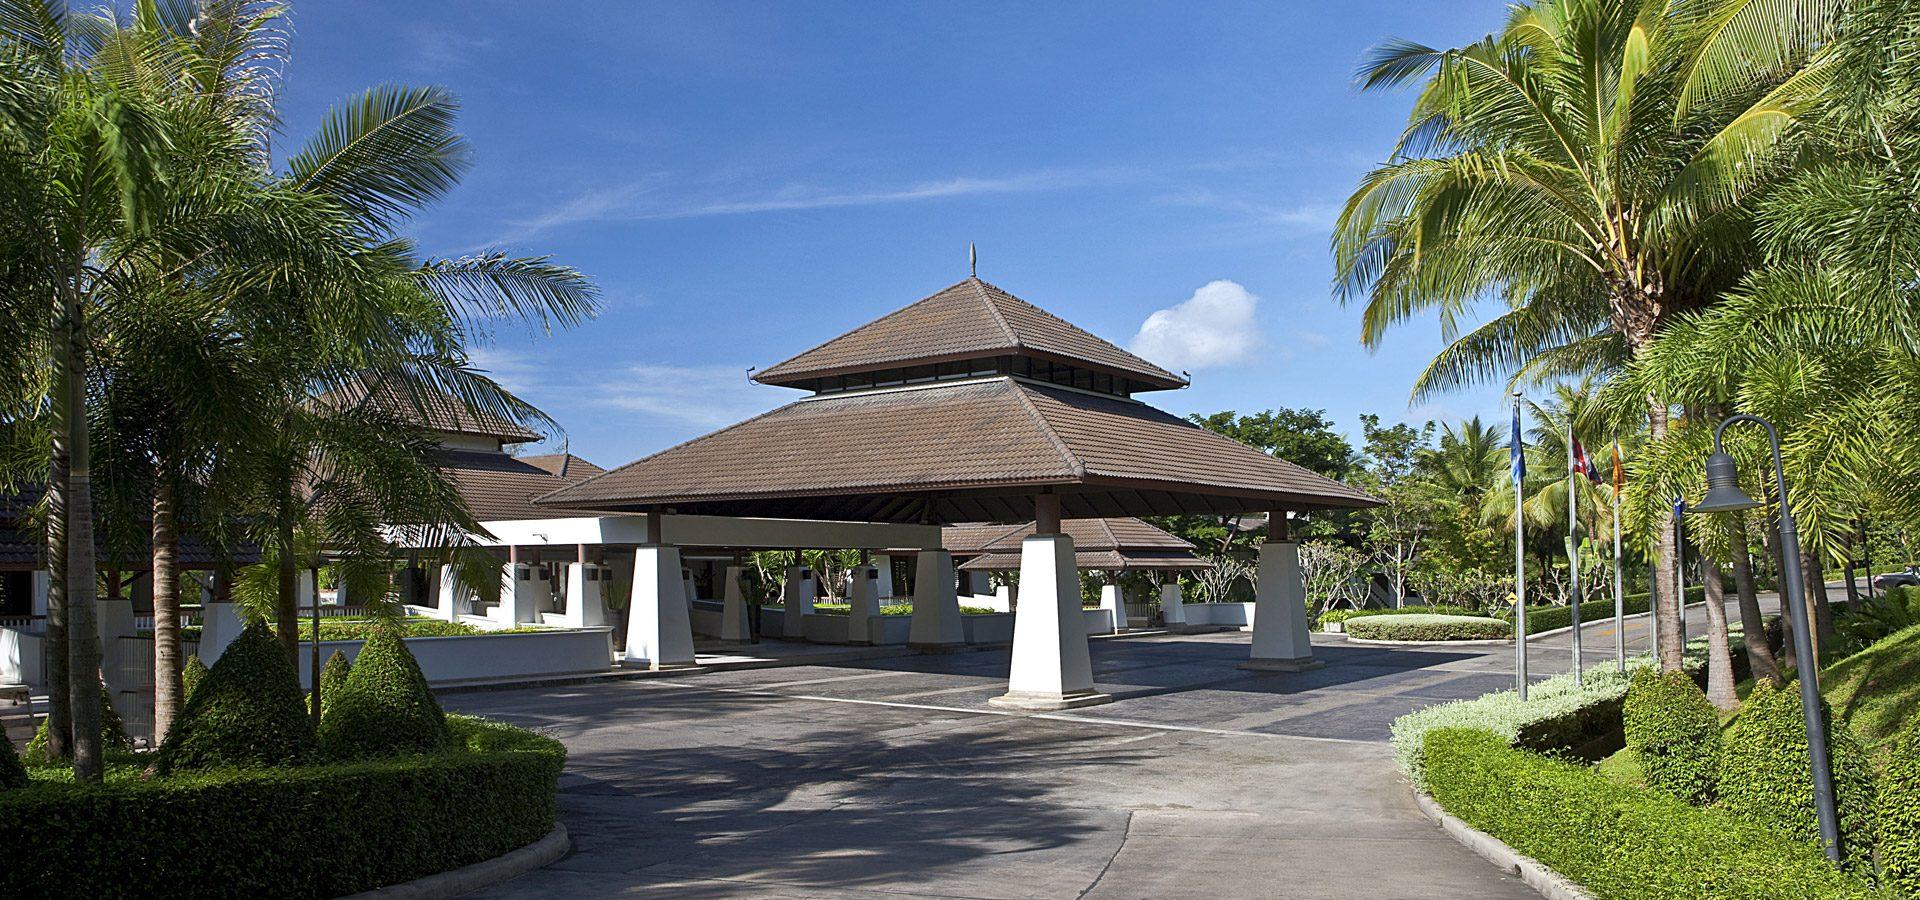 dusit thani krabi beach resort - home-entrance